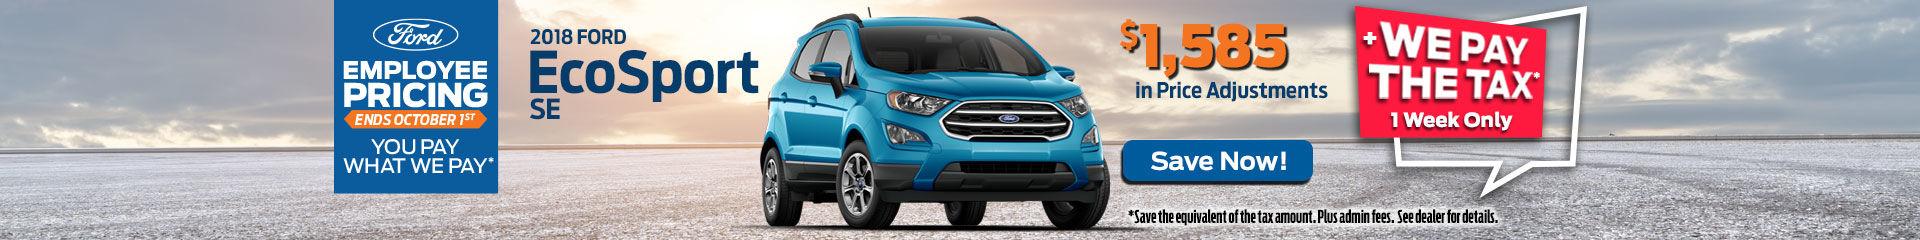 2018-09 Ford EcoSport